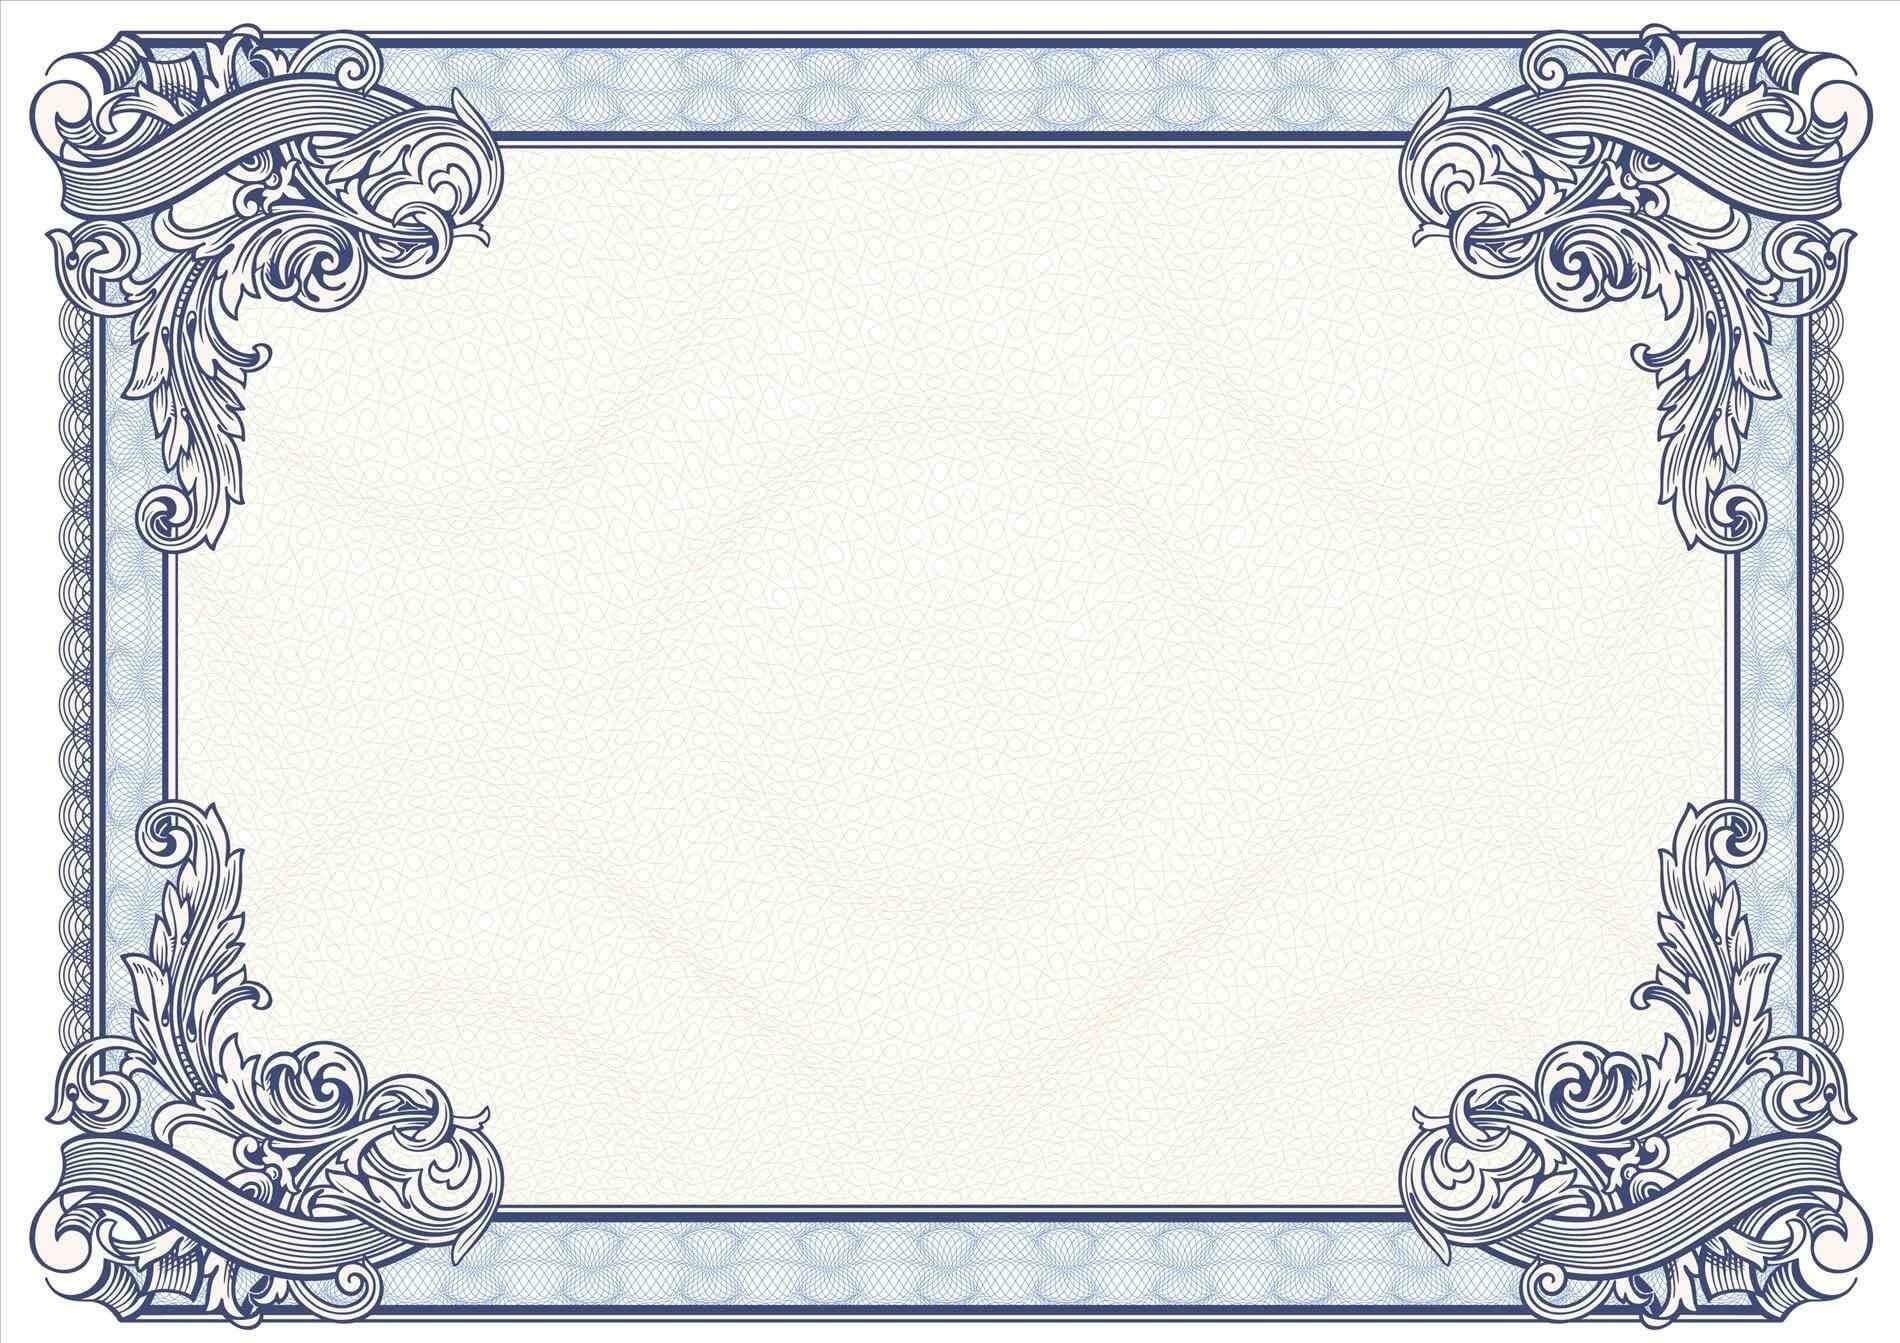 Certificate Borders Design Unique Certificate Border Design Within Certificate Border Design Templates